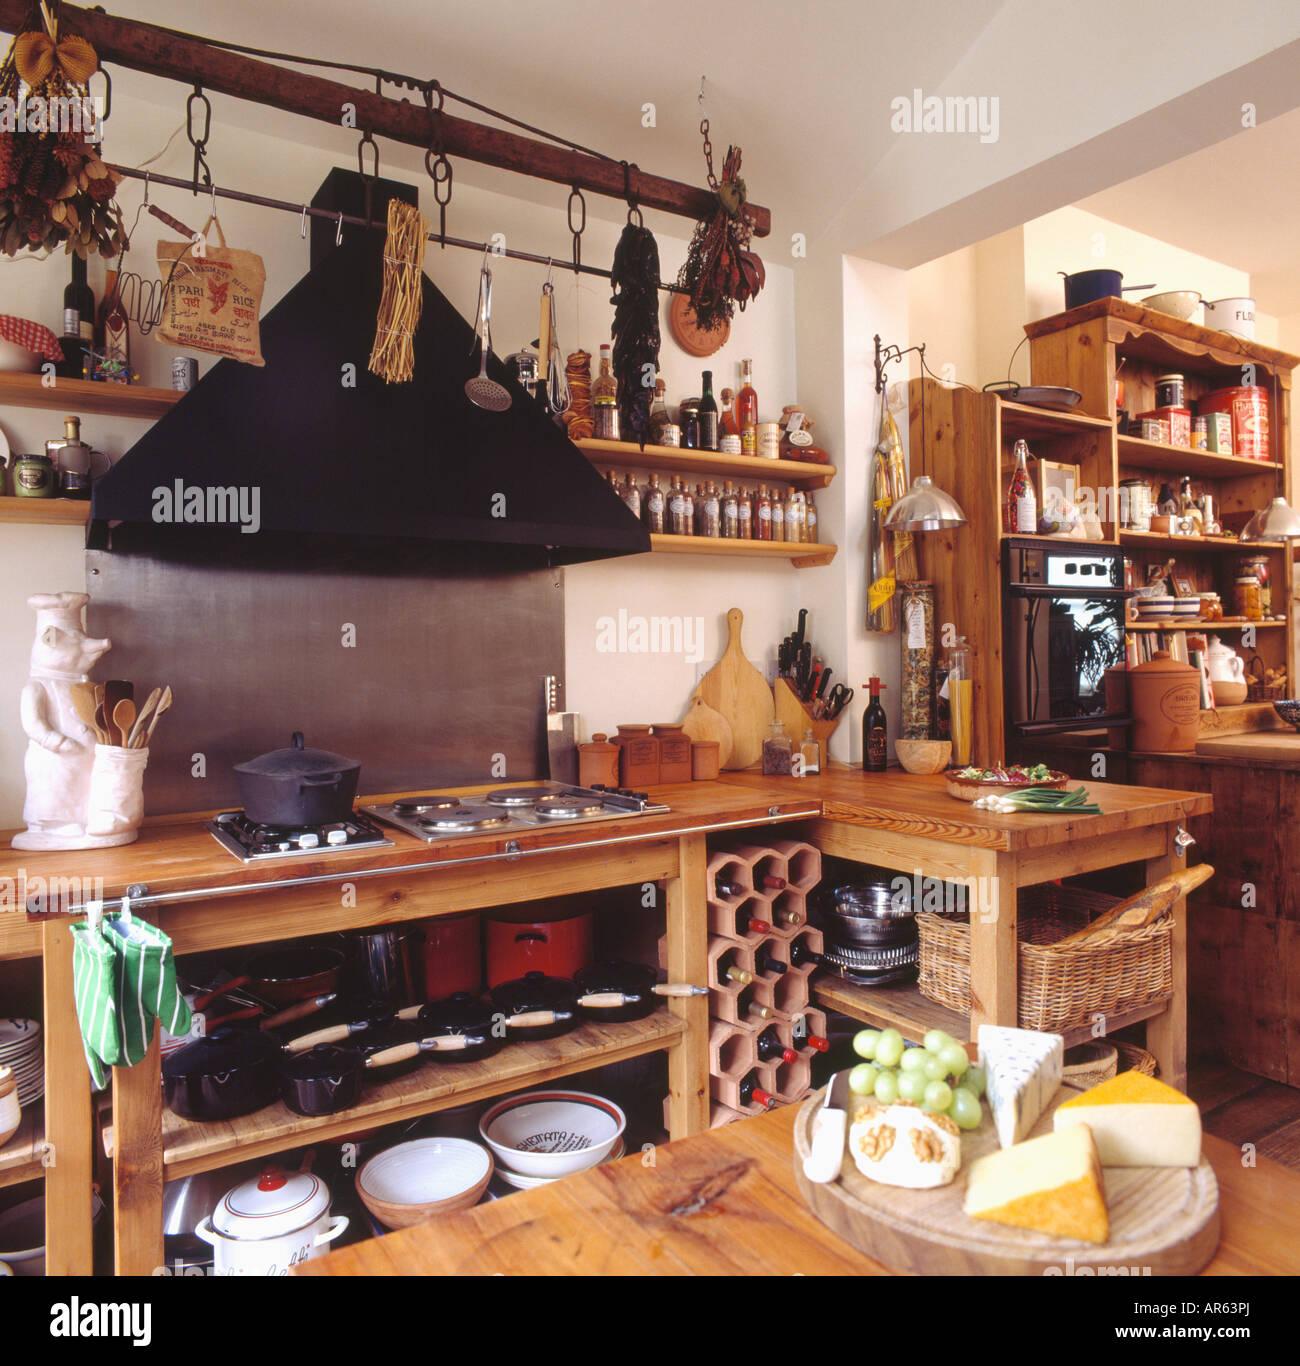 Plate Shelving In Stockfotos & Plate Shelving In Bilder - Alamy